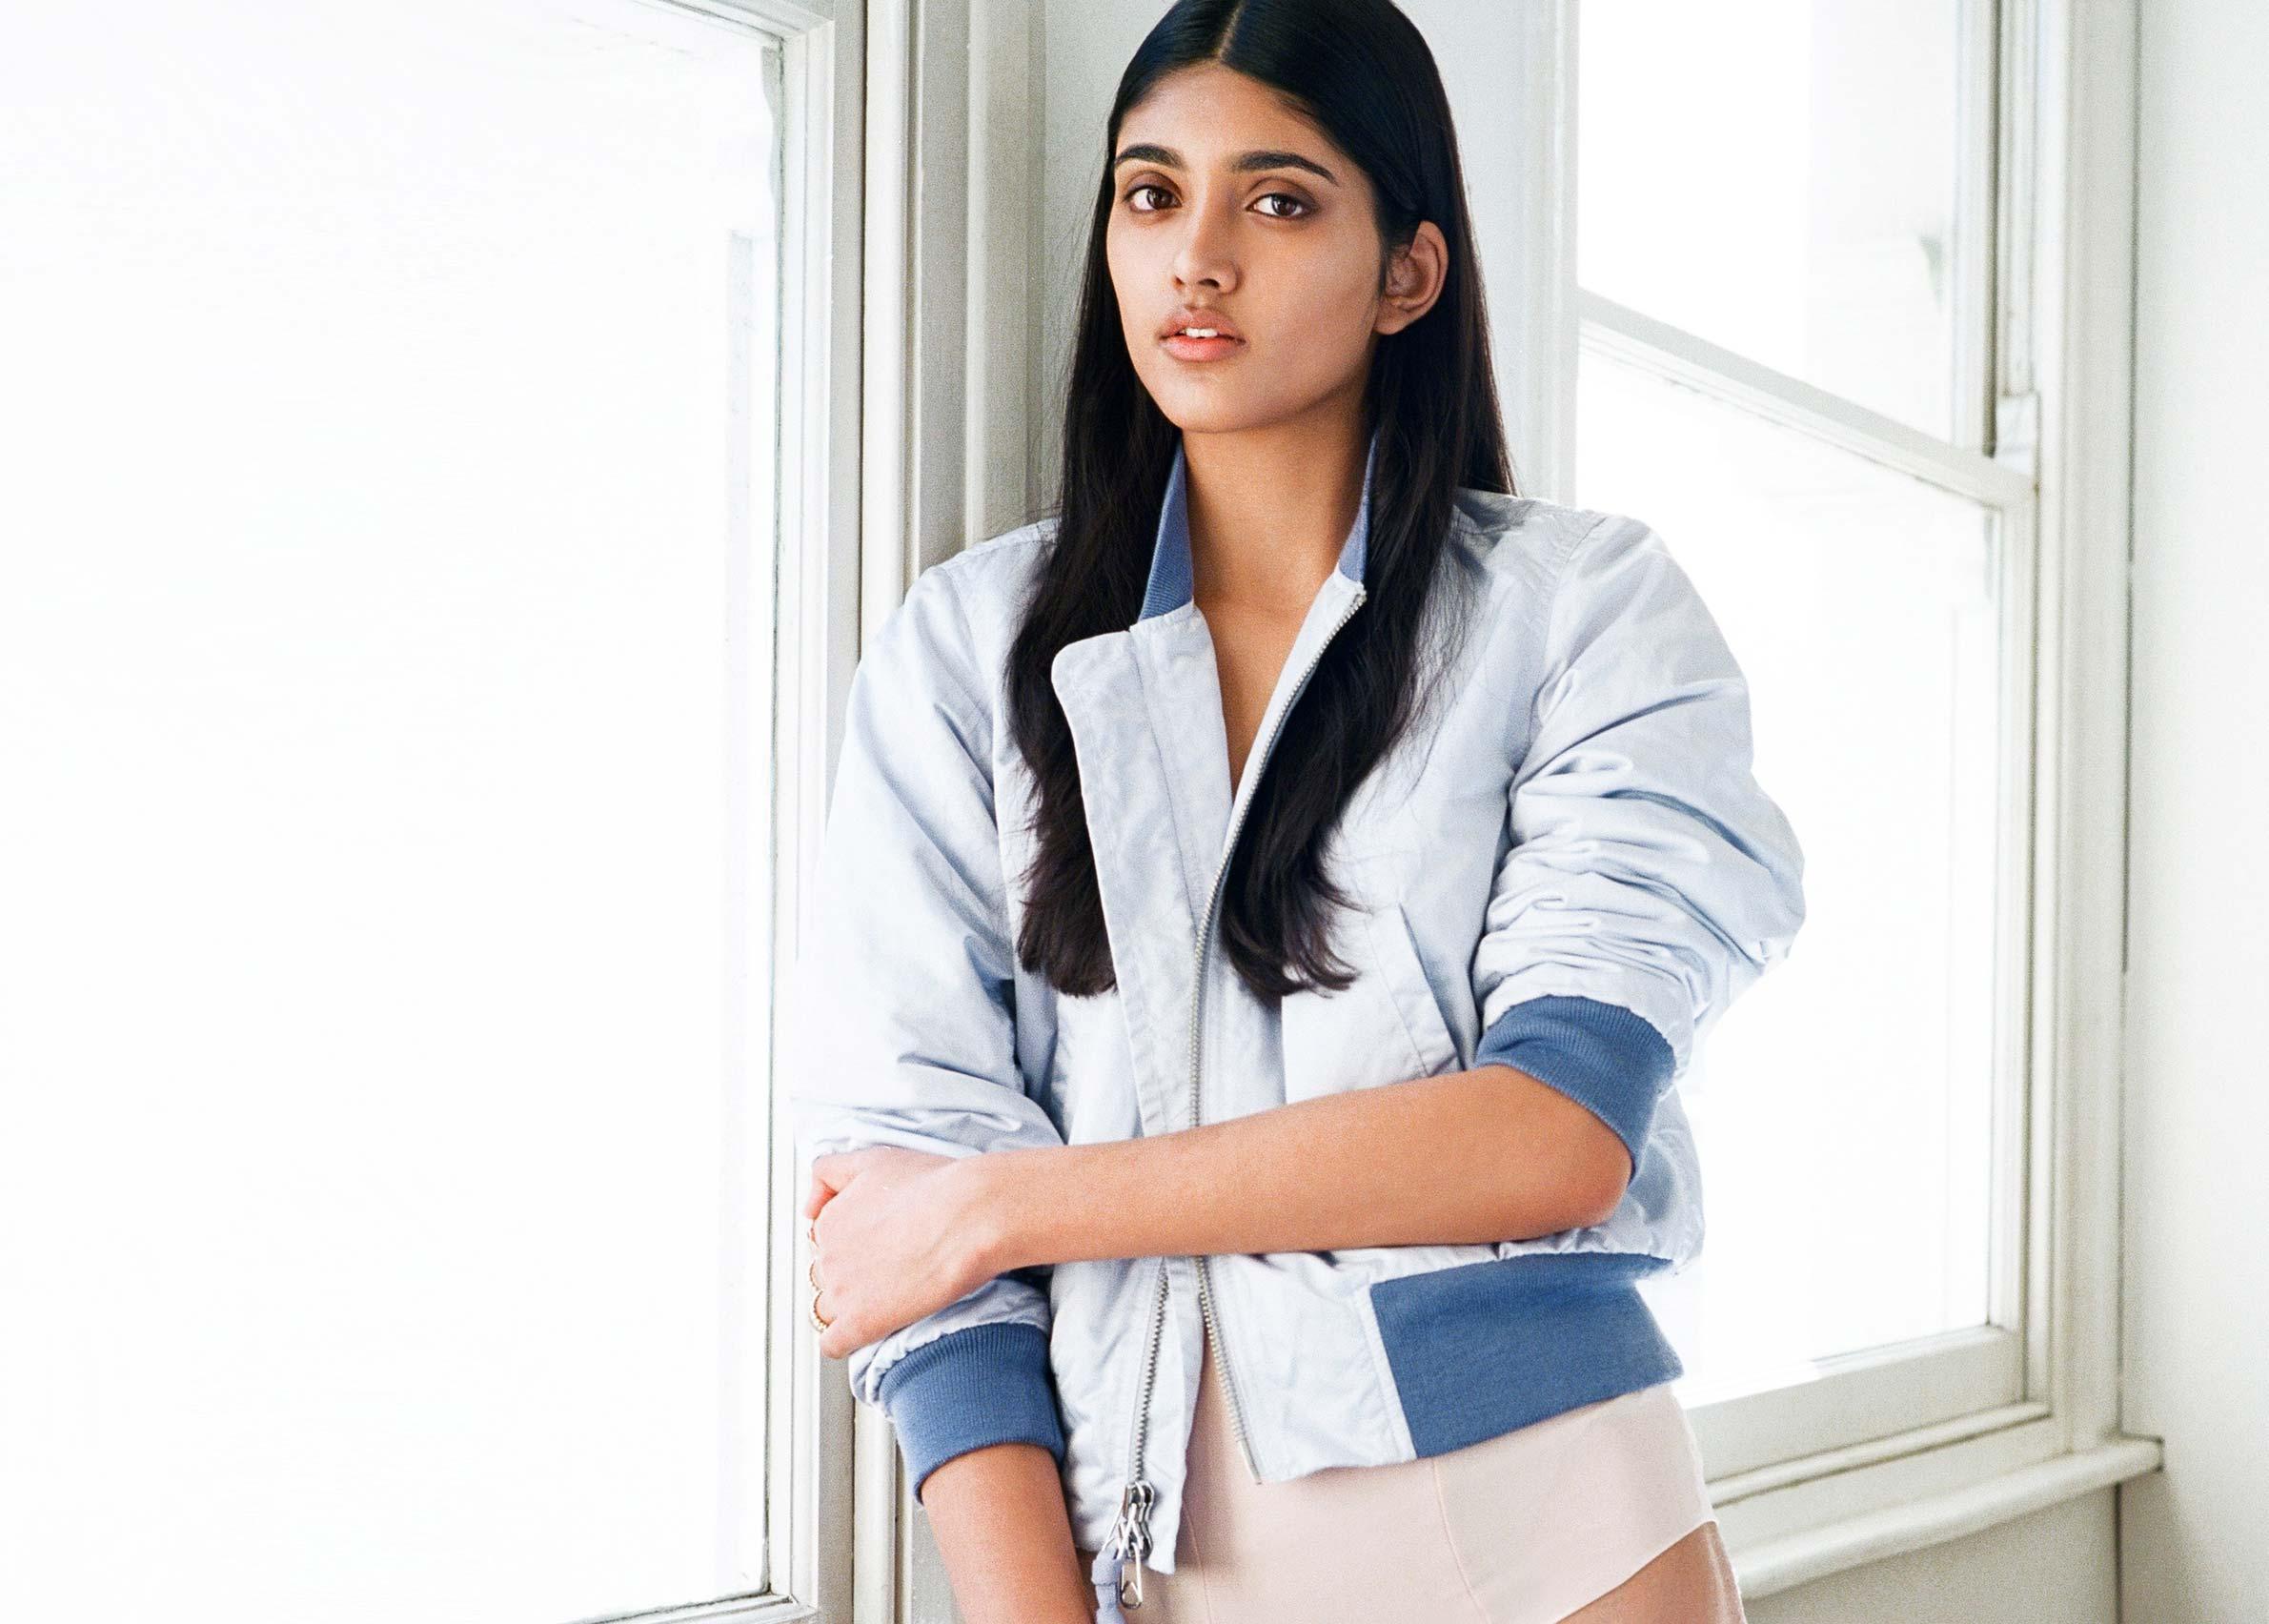 Neelam Gill, la nueva promesa del modelaje hindú